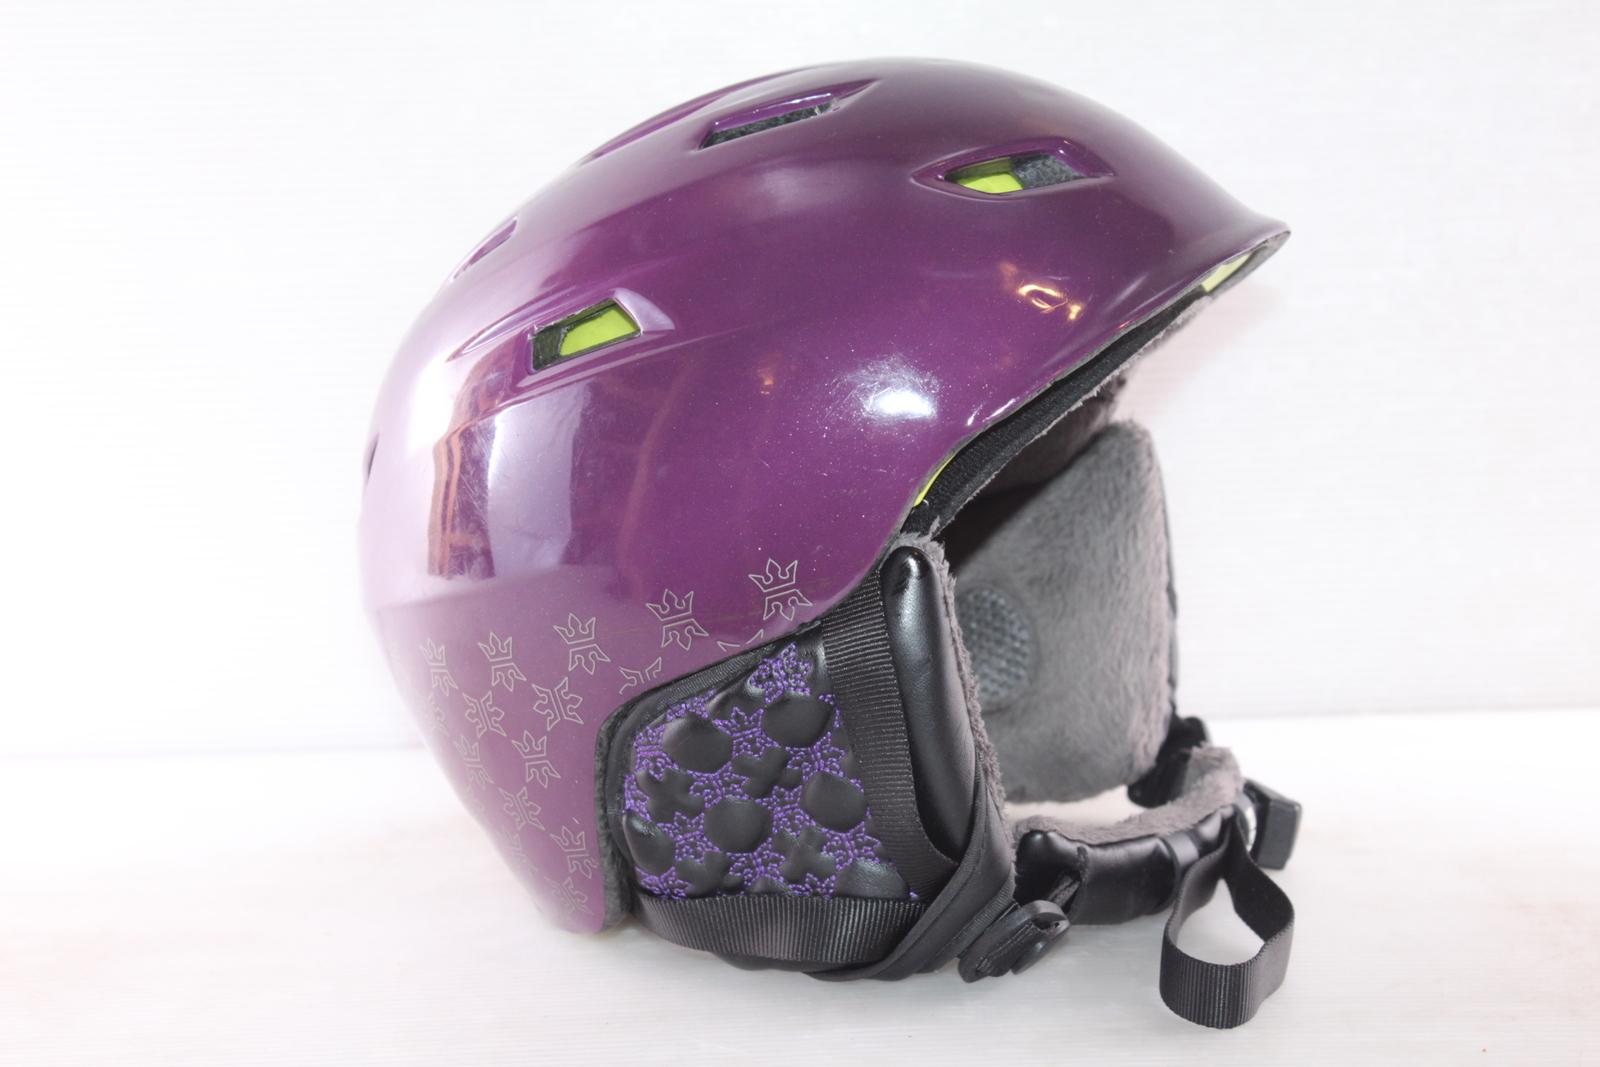 Dámská lyžařská helma Pret VTT2 - posuvná vel. 55 - 59